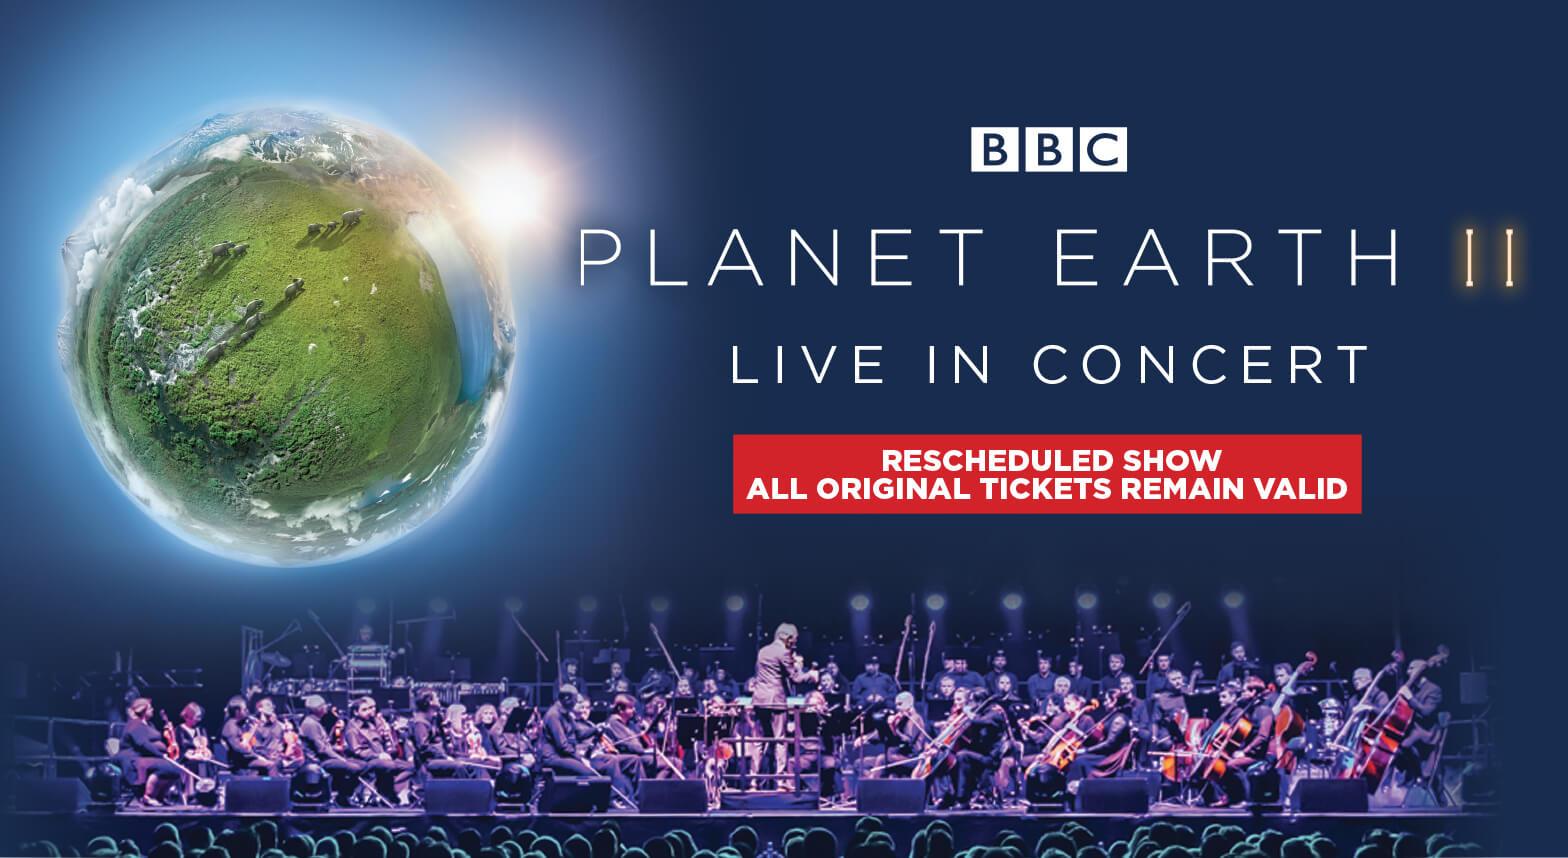 planet-earth-arenas-reschedule.jpg